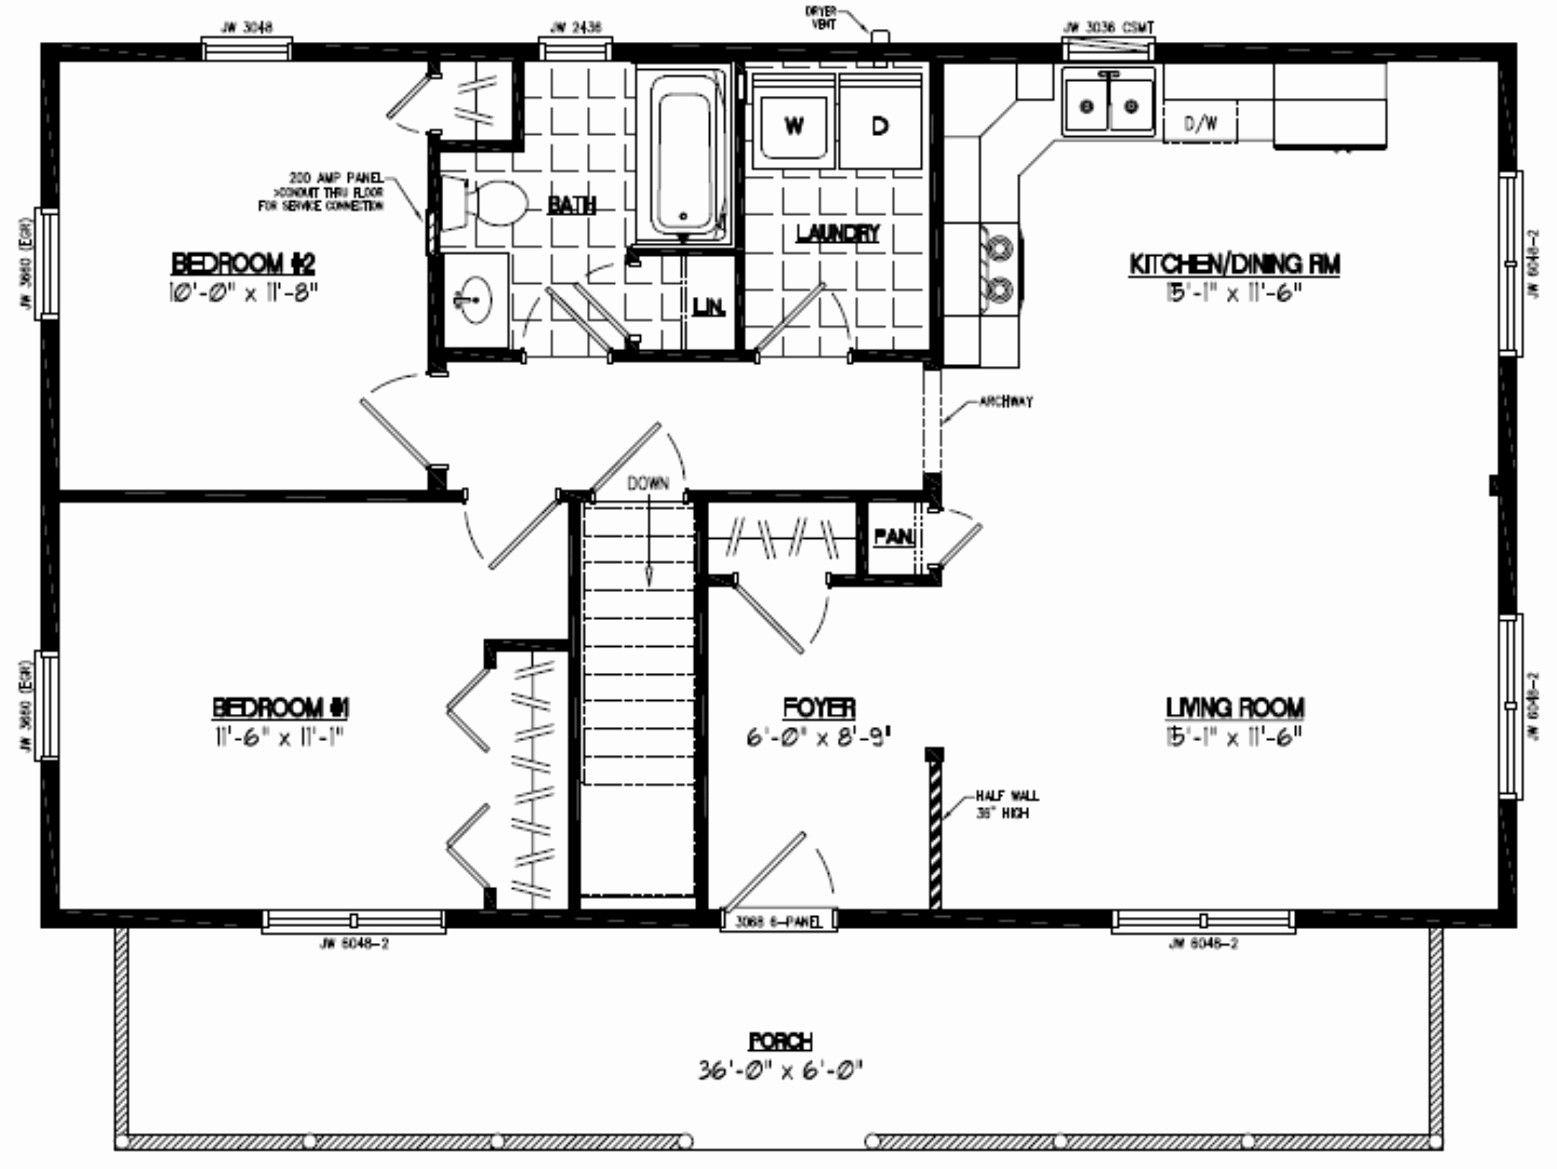 30 X 40 2 Story House Floor Plans Elegant 24 Nikura Lovely 1 Bedroom House Plan With Loft Cabin Floor Plans Barndominium Floor Plans